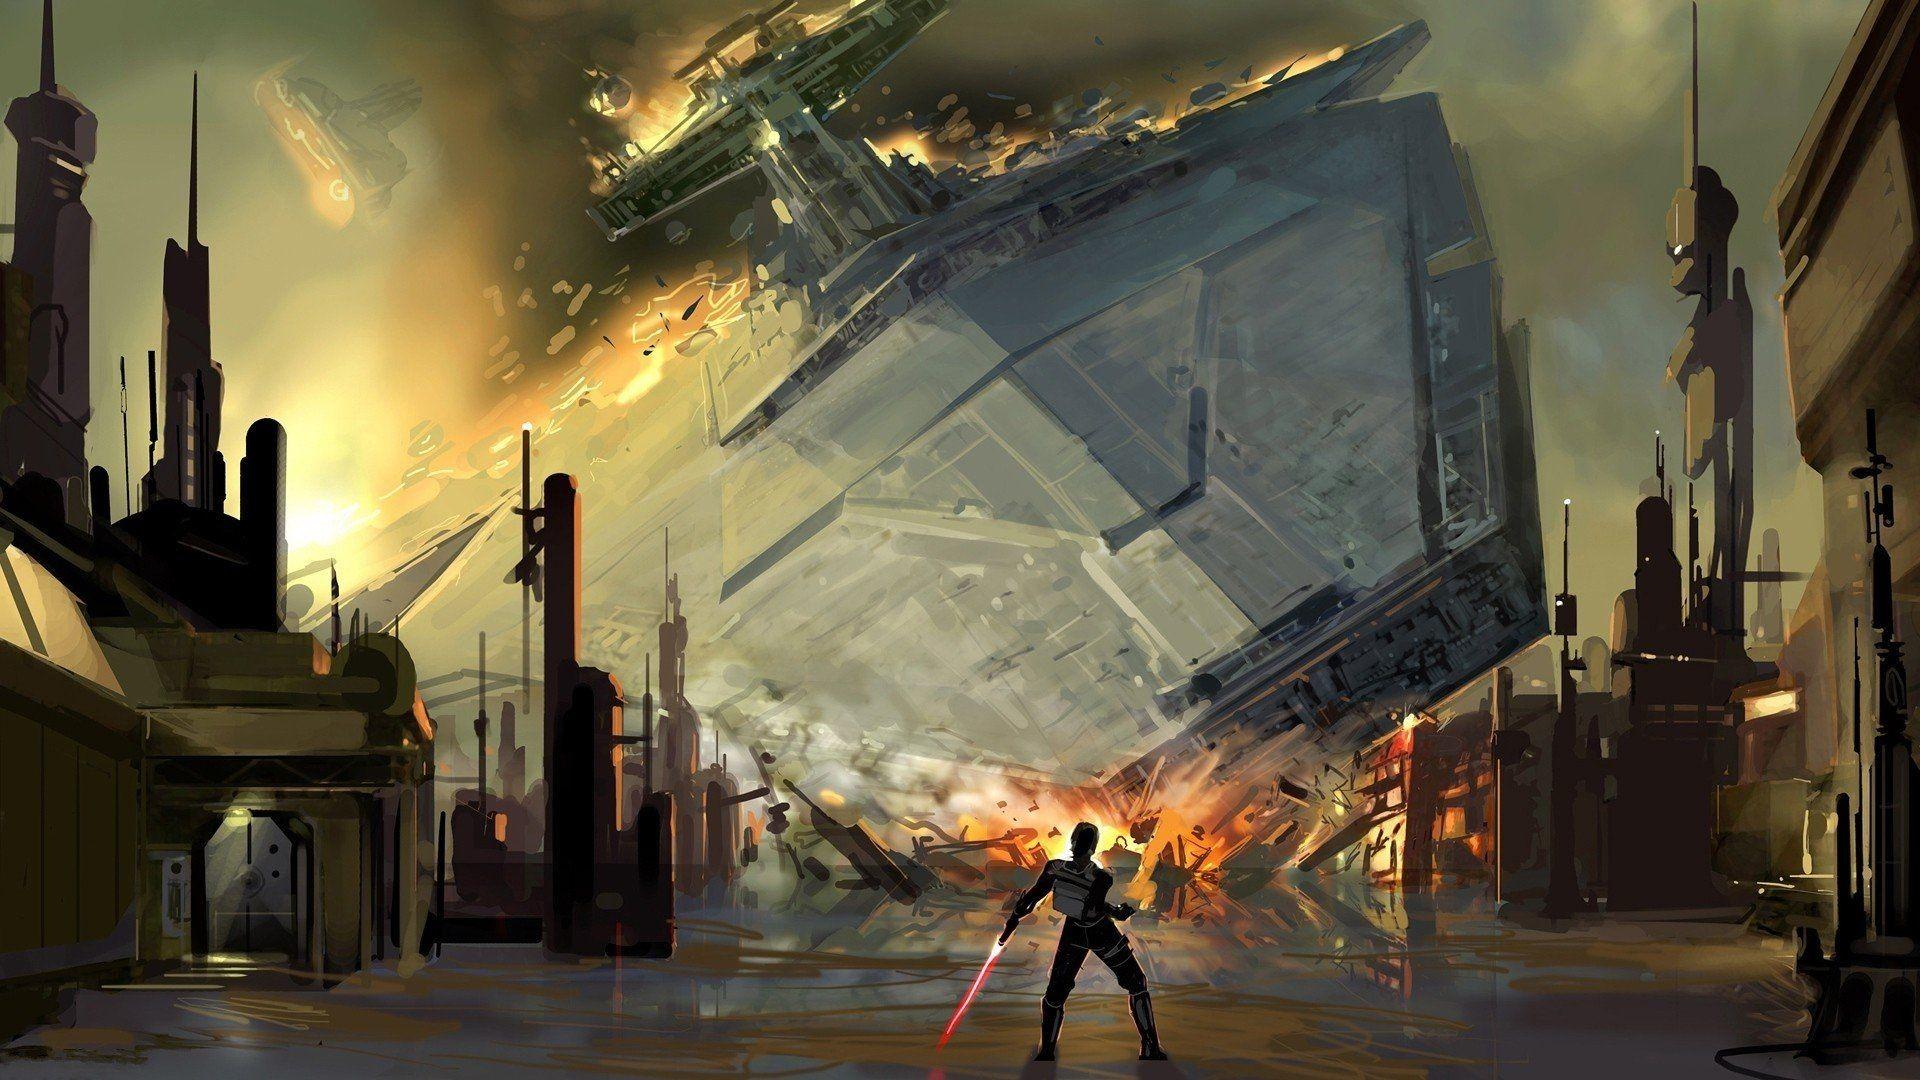 Star Wars digital art artwork wallpaper